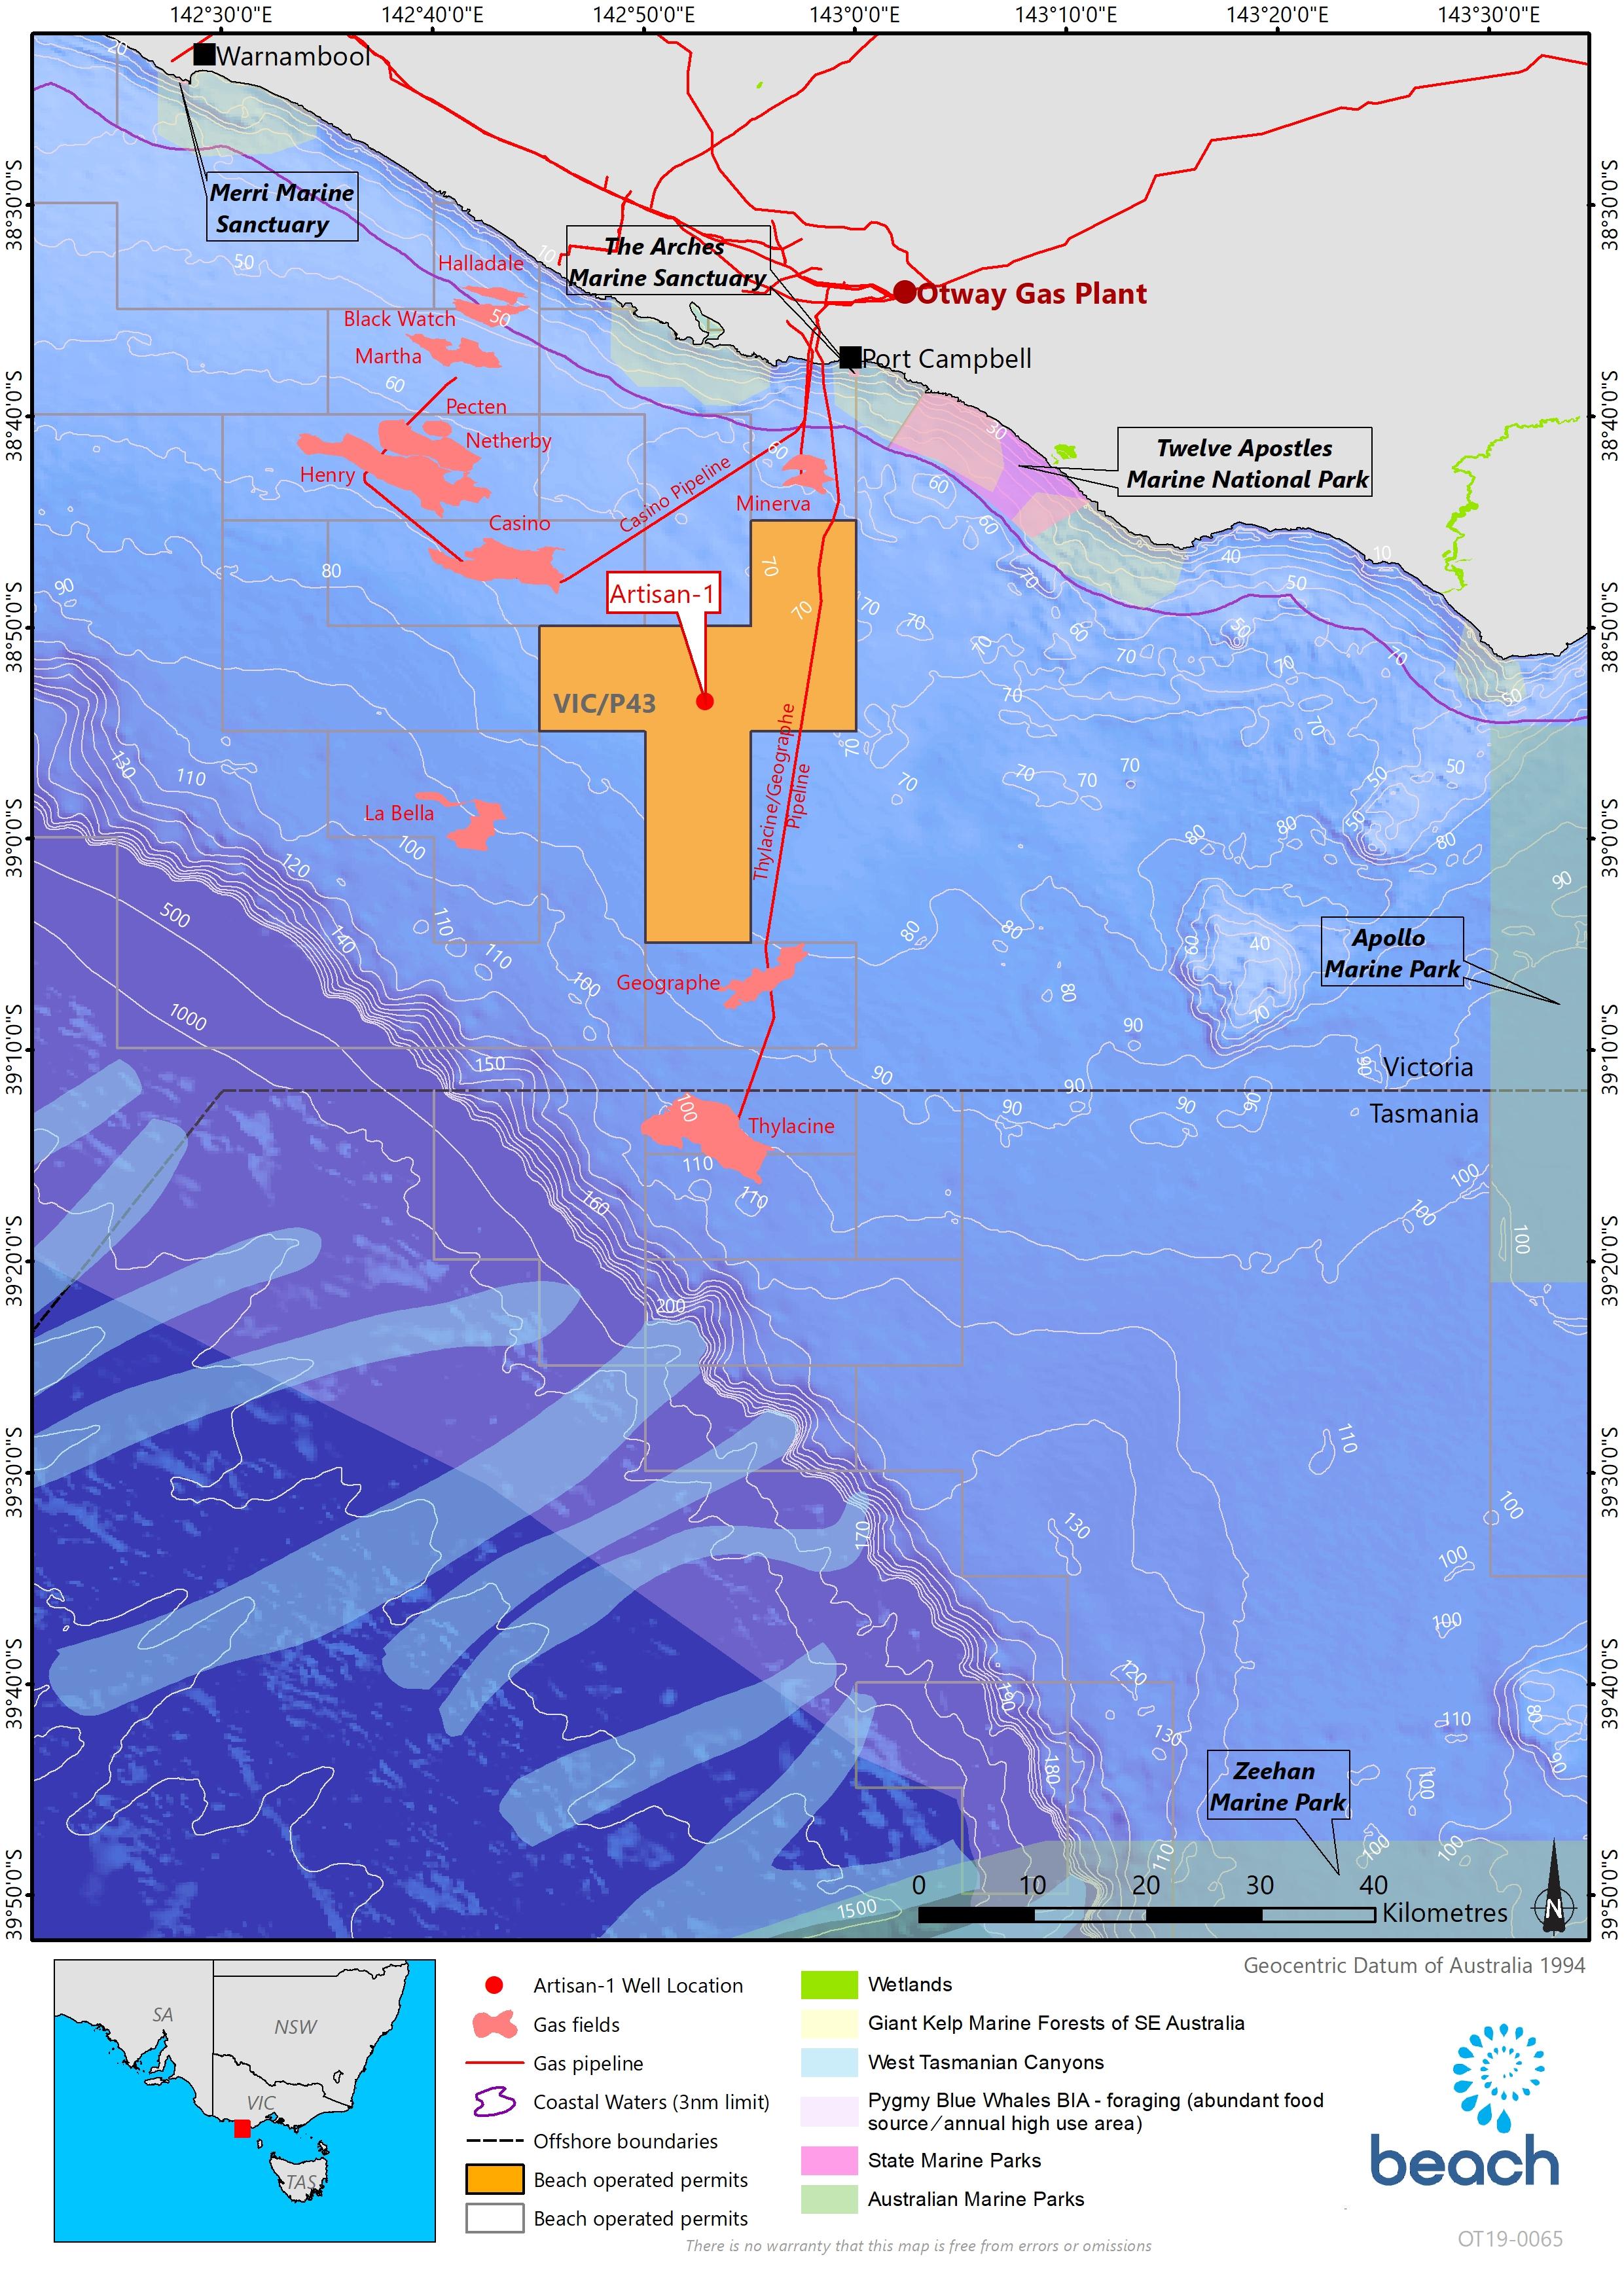 Location map - Activity: Artisan Exploration Drilling (refer to description)